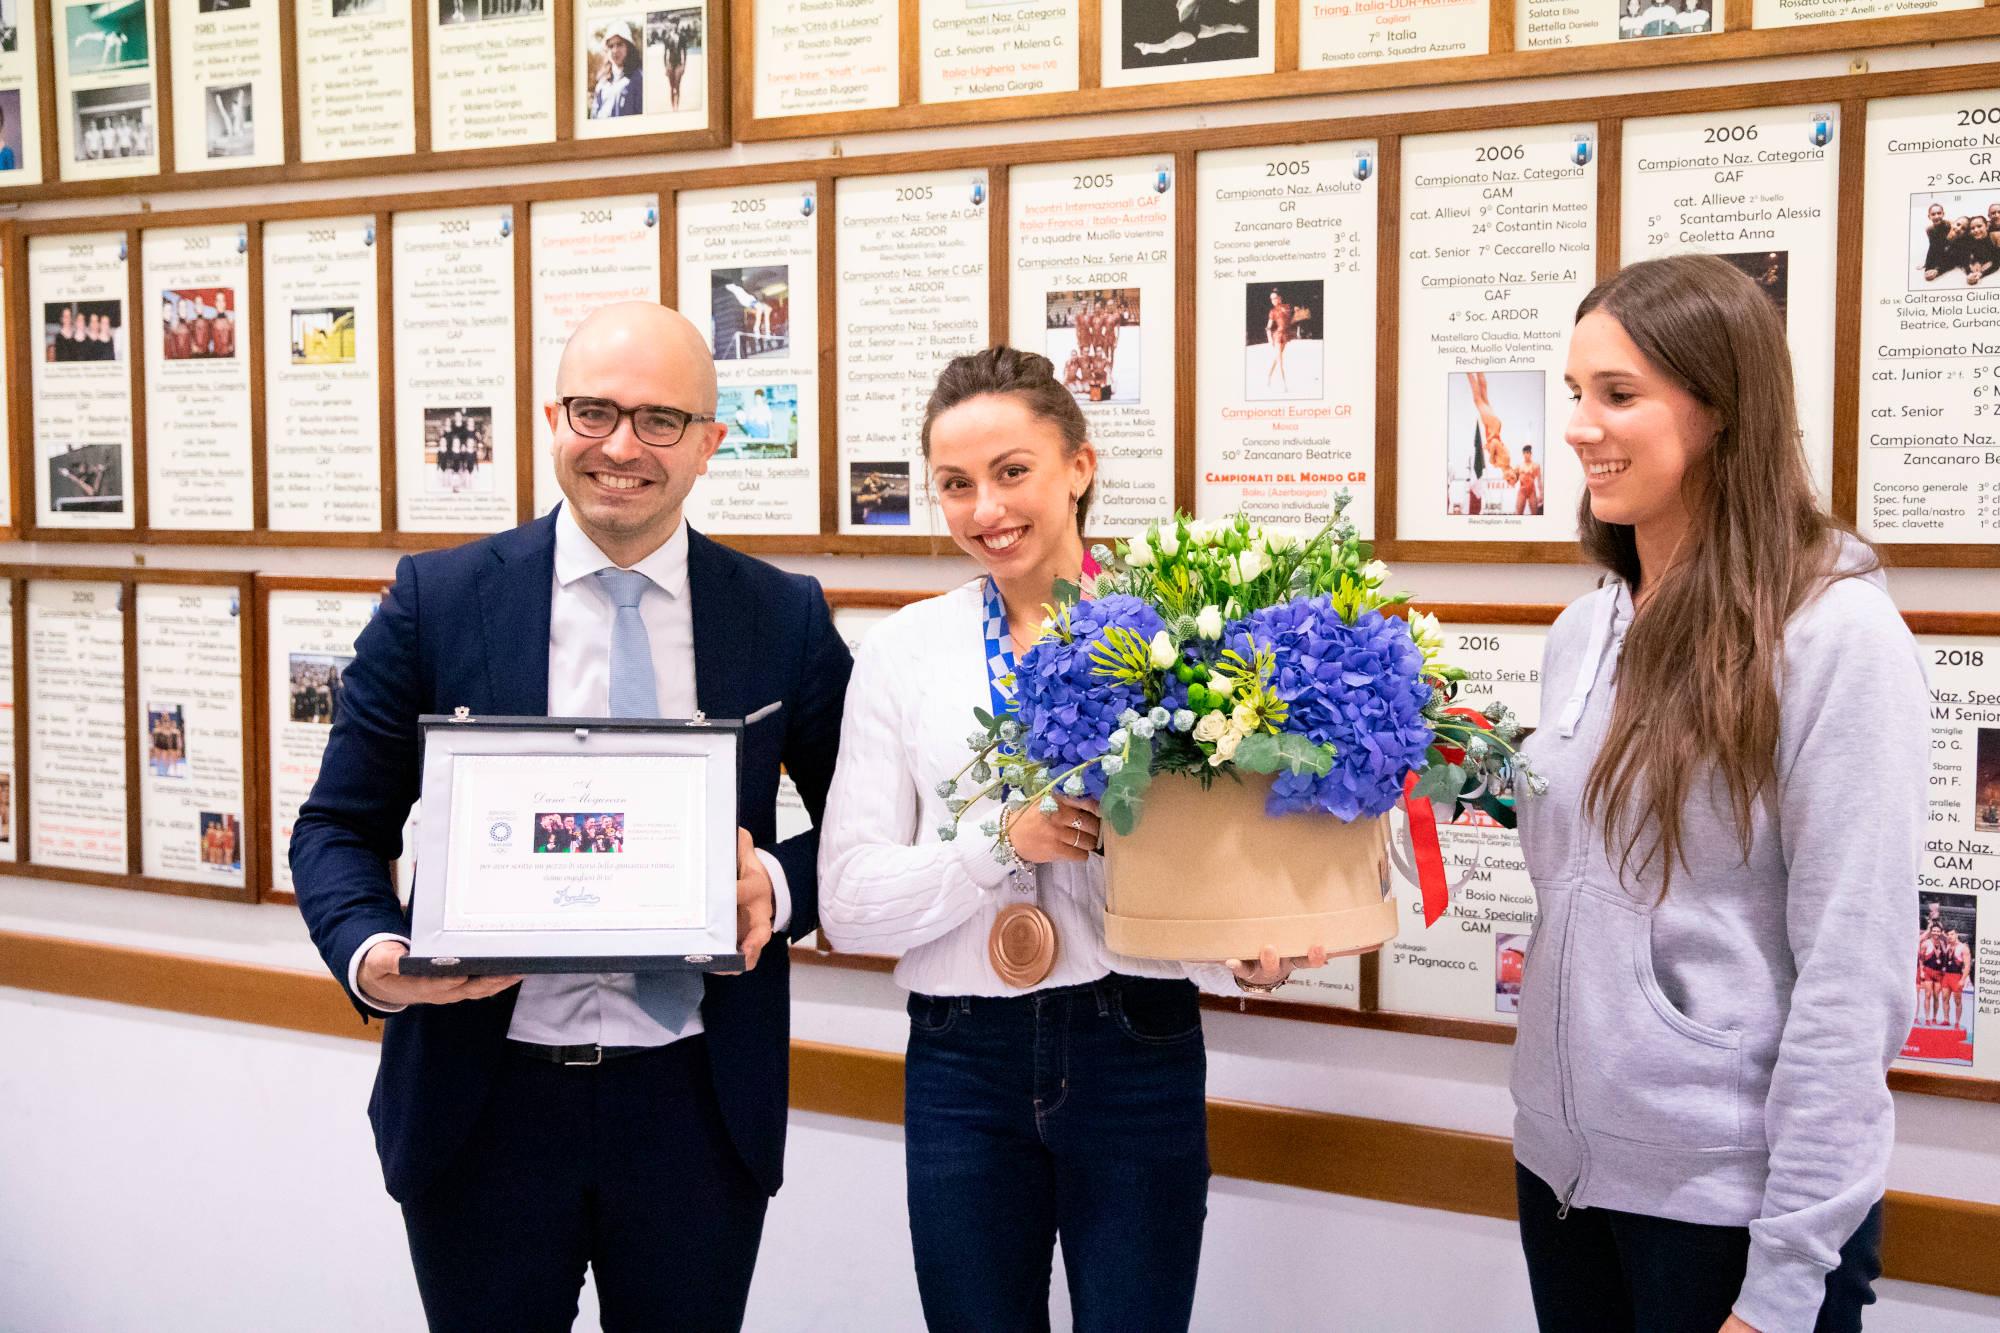 daniela-mogurean-bronzo-olimpiadi-tokyo-2020